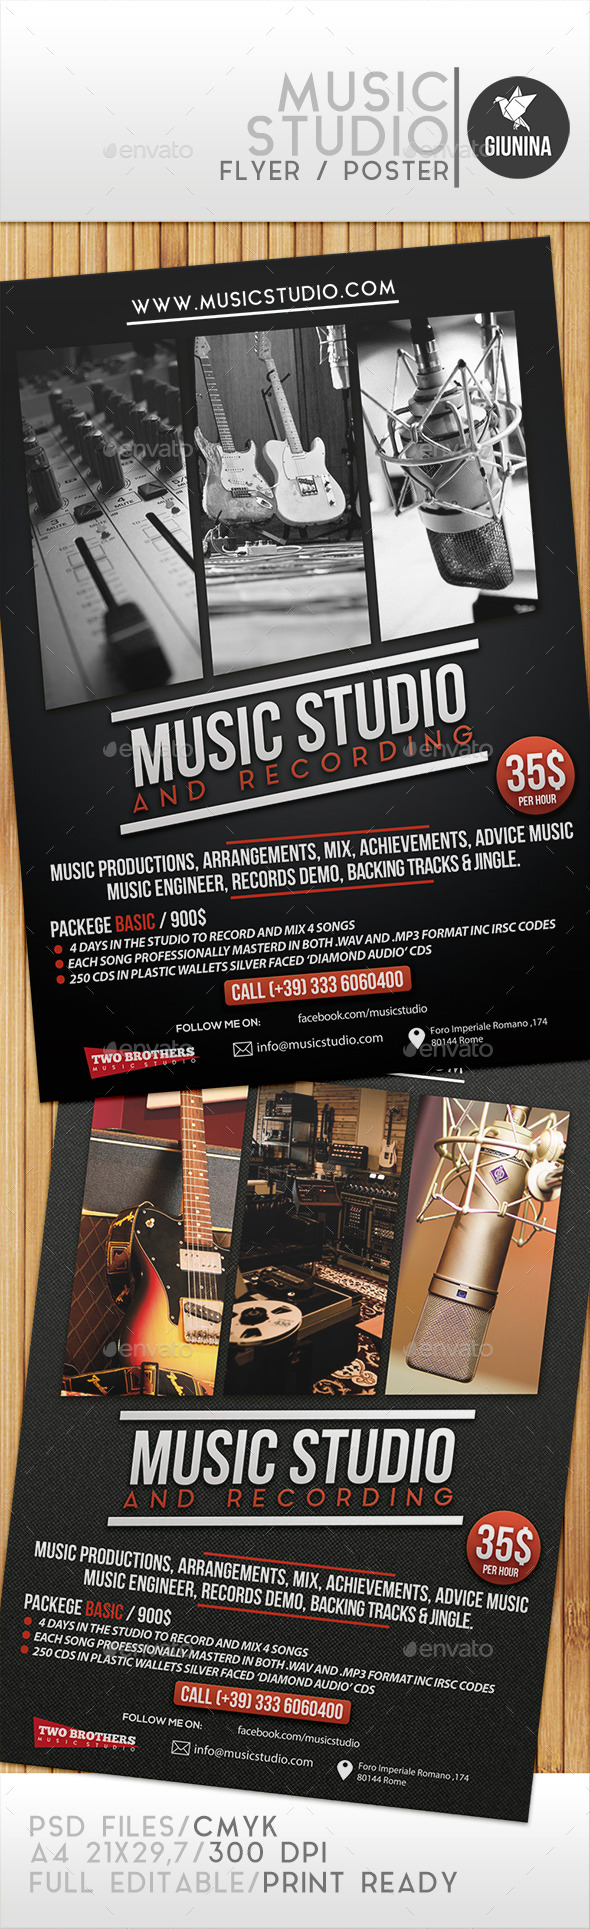 Music Studio Flyer/Poster - Commerce Flyers